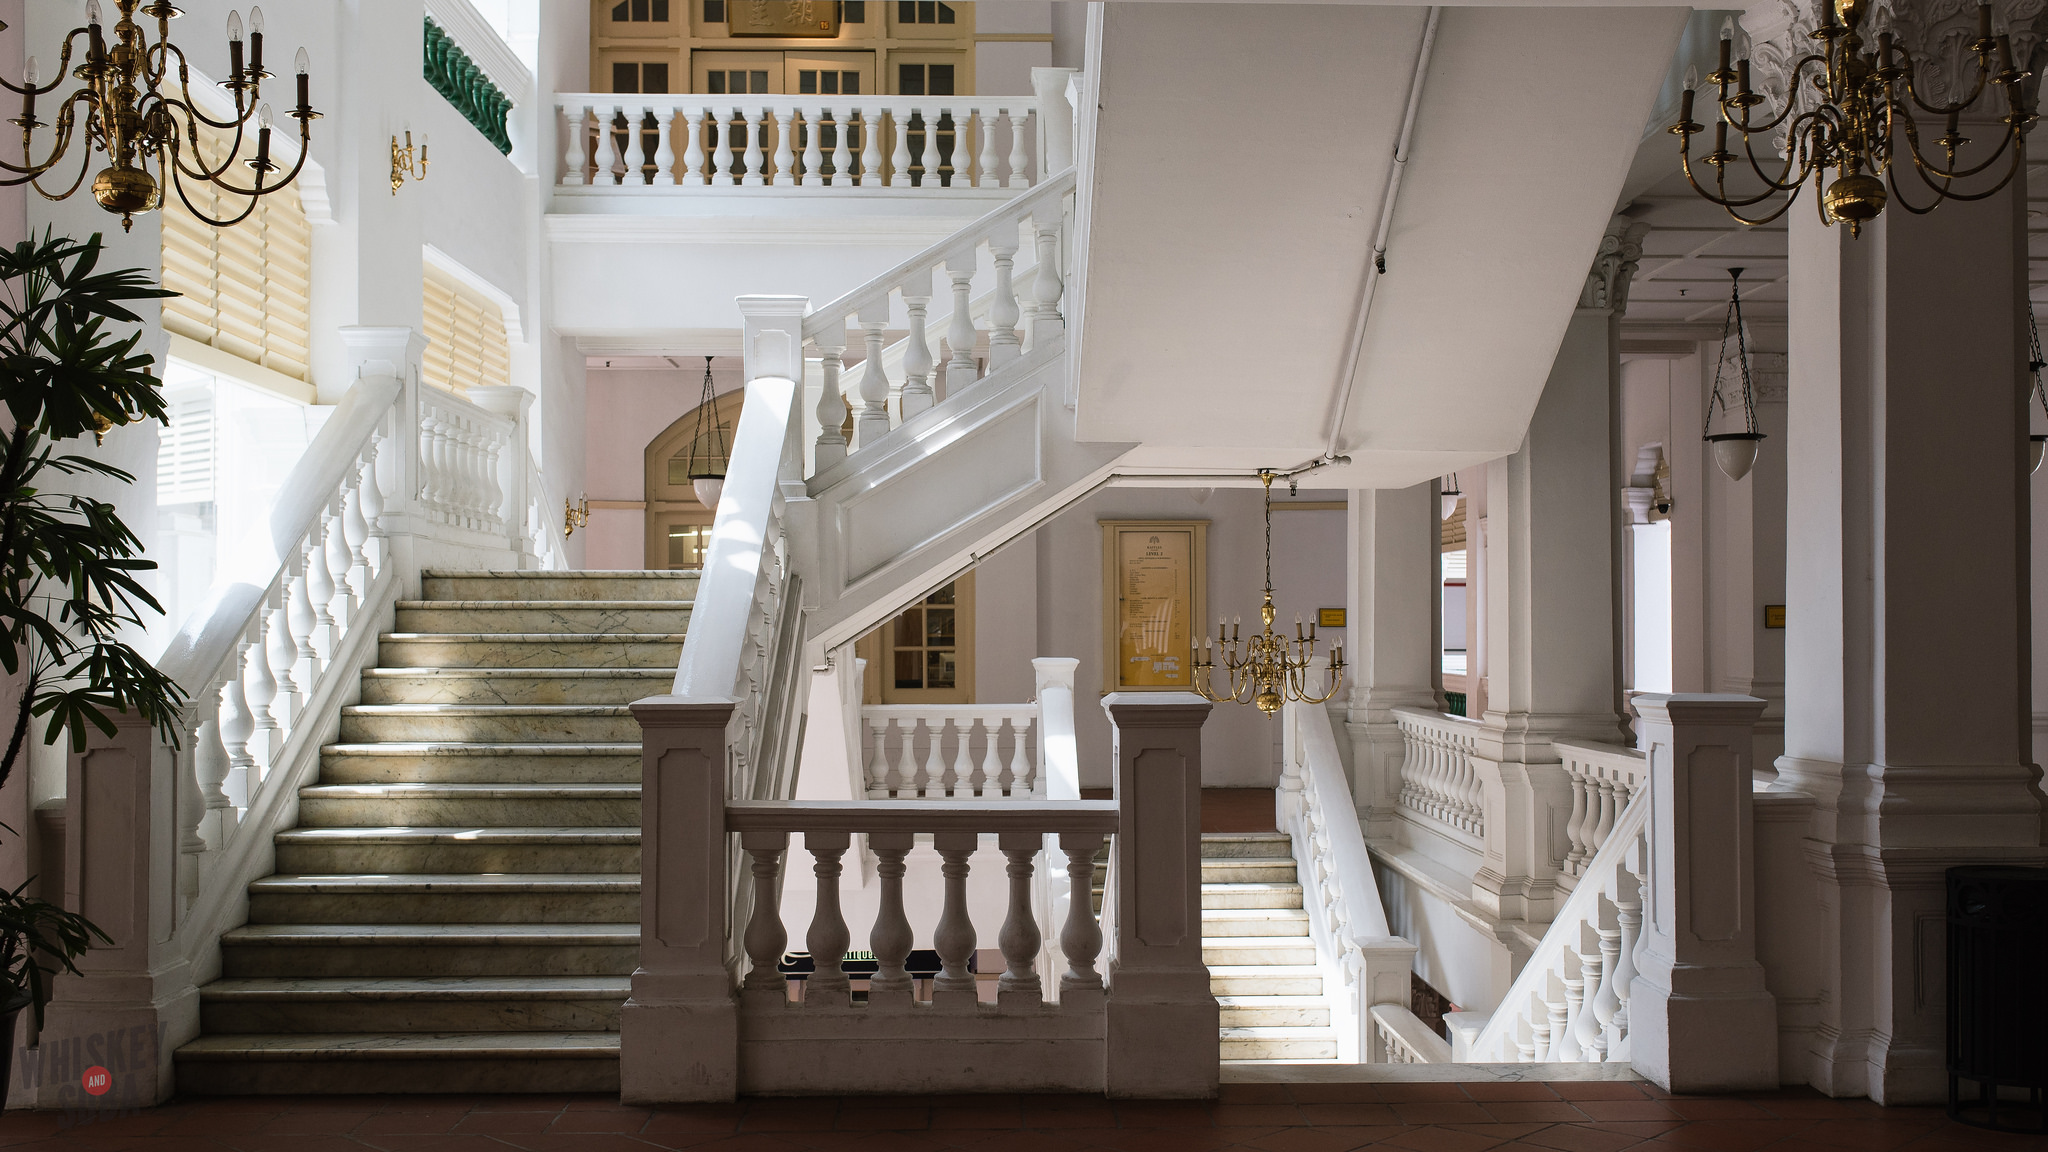 Stairway at The Raffles Hotel Singapore